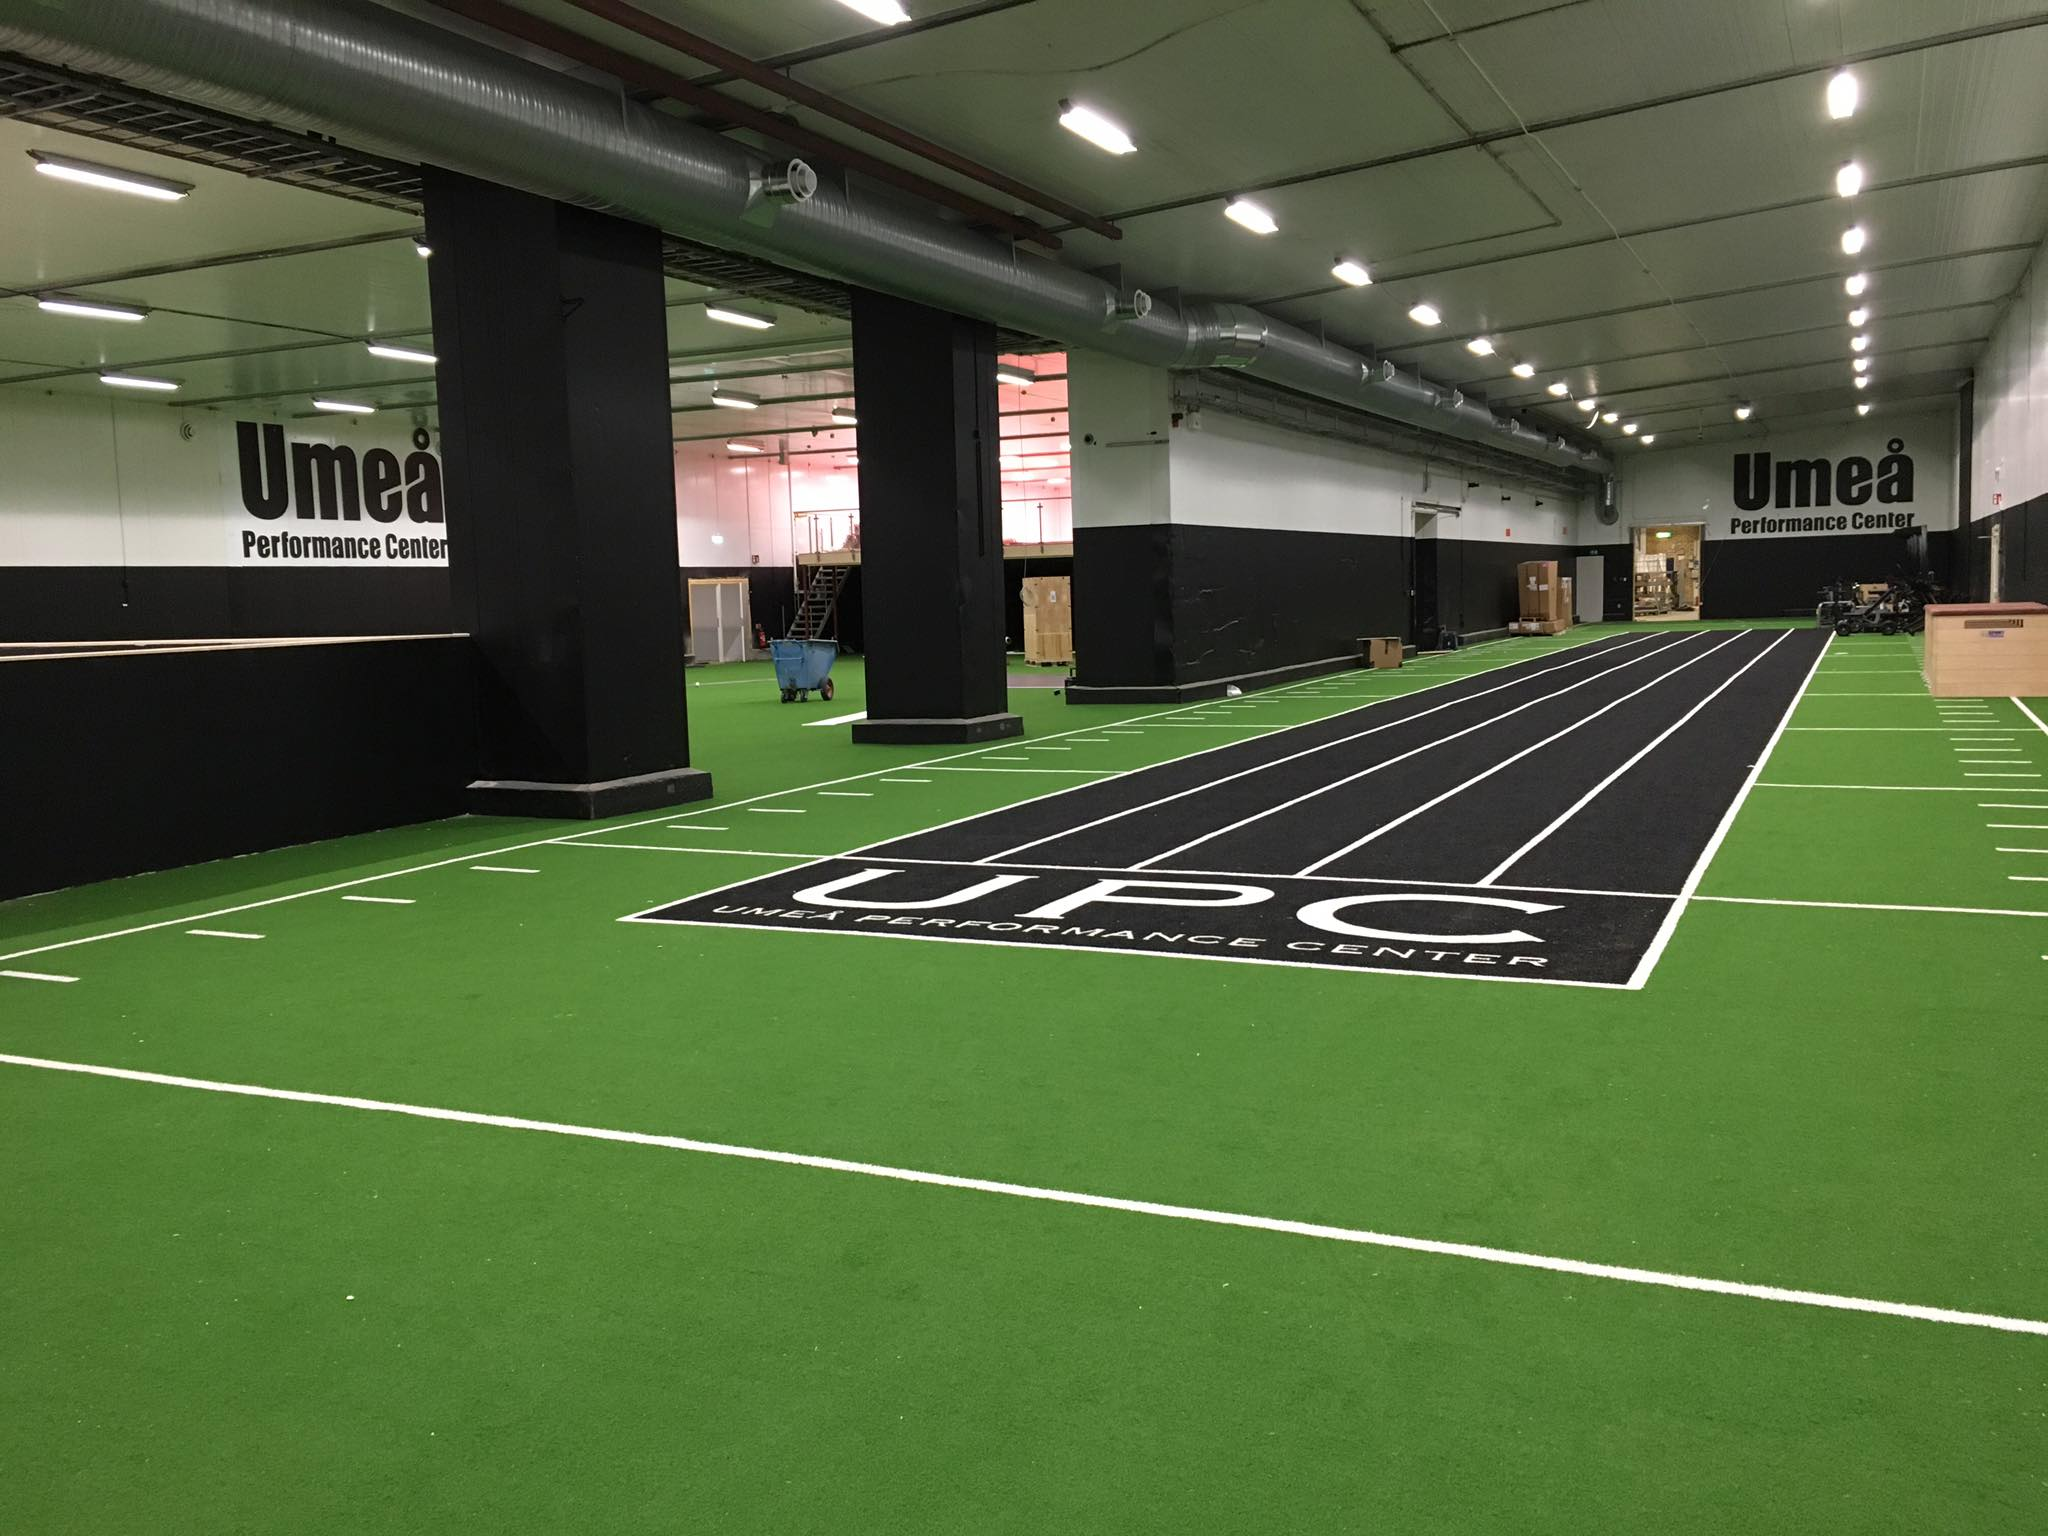 kunstgressbana løpebane gym unisportt